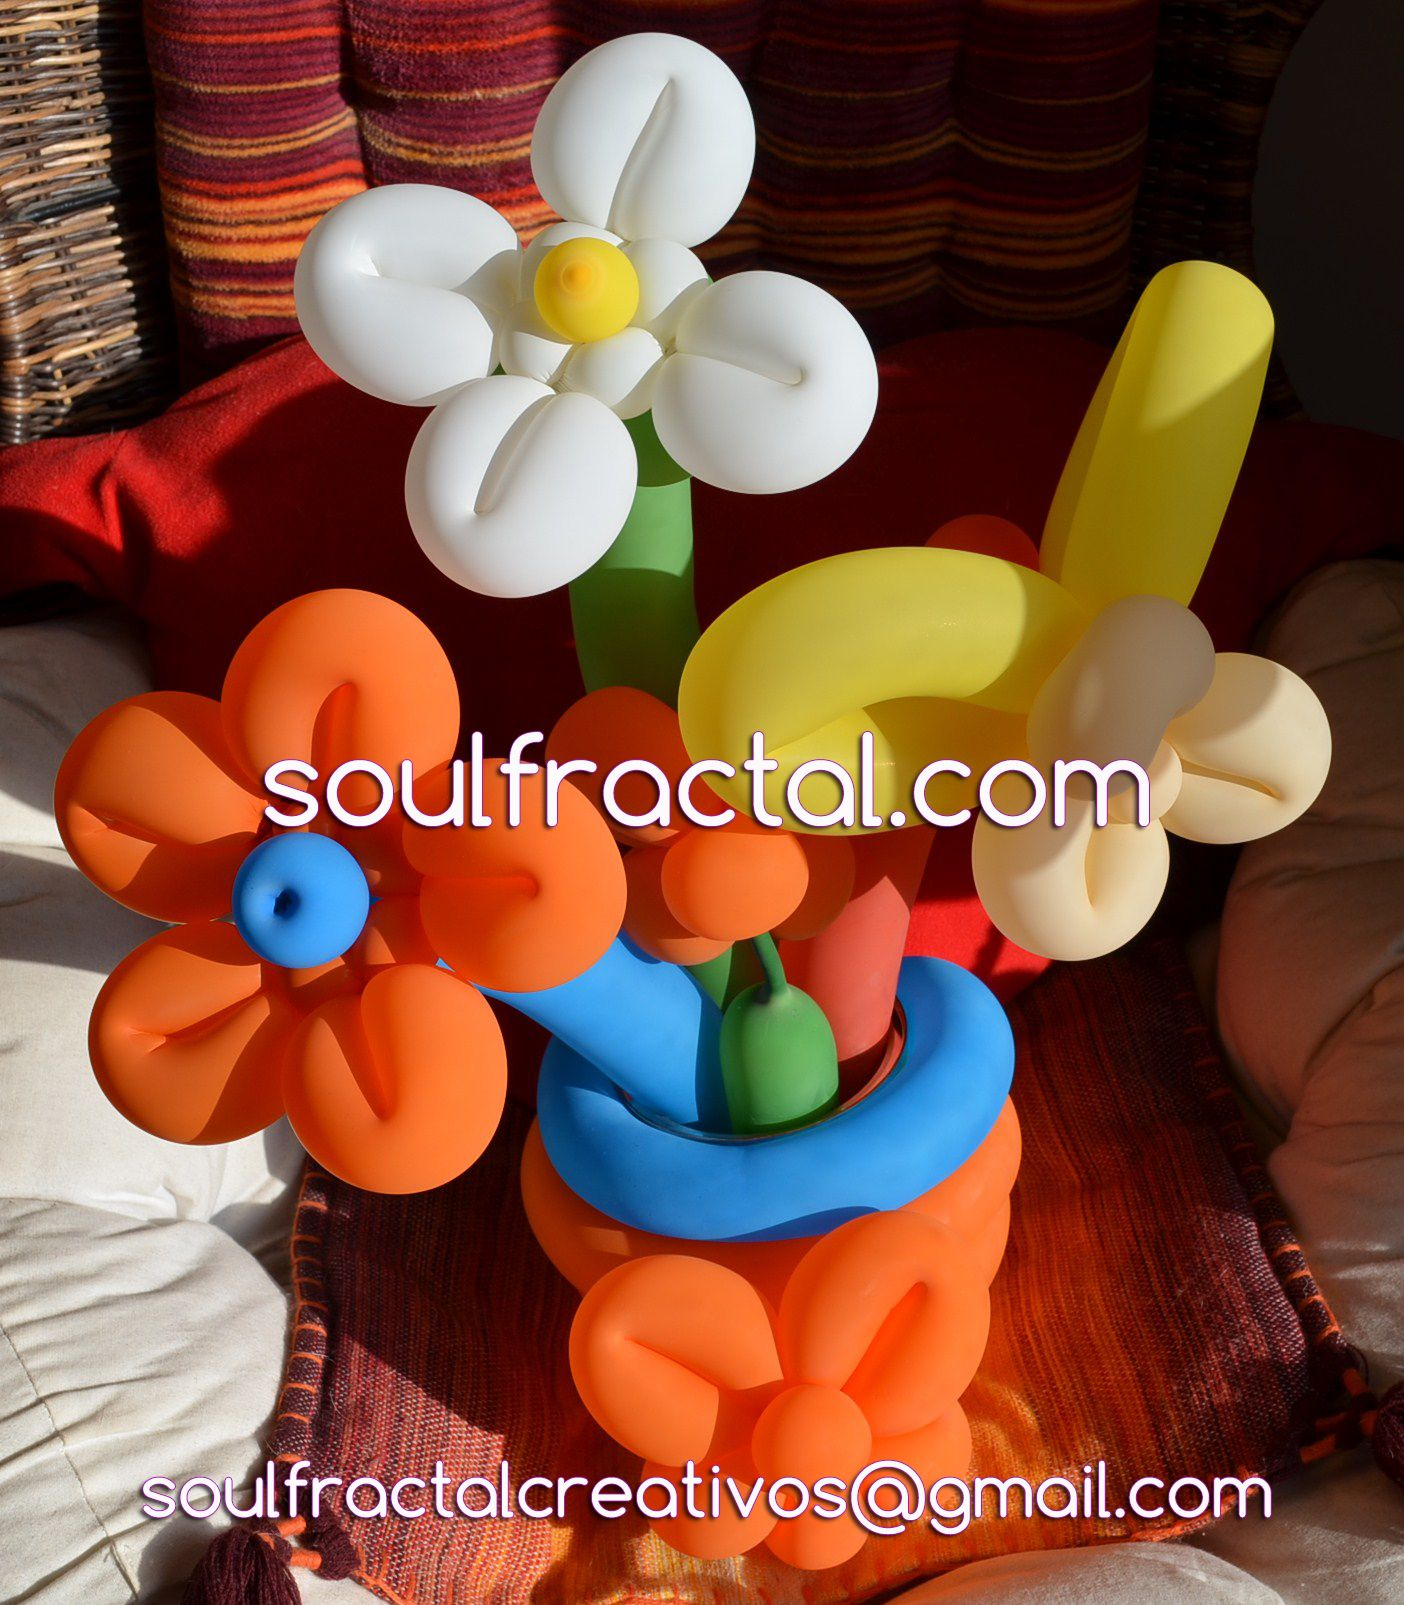 #Arte con #Globos Soul Fractal  ¿Quienes somos? ❥ Aquí nos tenéis ツღ .> https://soulfractal.com/quienes-somos/   ツ Síguenos en:  ✿ Web:  https://www.soulfractal.com  ✿ Facebook:  https://www.facebook.com/soulfractal/  ✿ Twitter: https://twitter.com/SoulFractal2015 ✿ Instagram : https://www.instagram.com/soulfractal/  ✿ YouTube: https://www.youtube.com/channel/UCTYFXZXYPsLGAuaAPPQr3_g  ✿ G+: https://plus.google.com/collections/yours  #Decoración #Creatividad #Art #Globoflexia #Decoracion